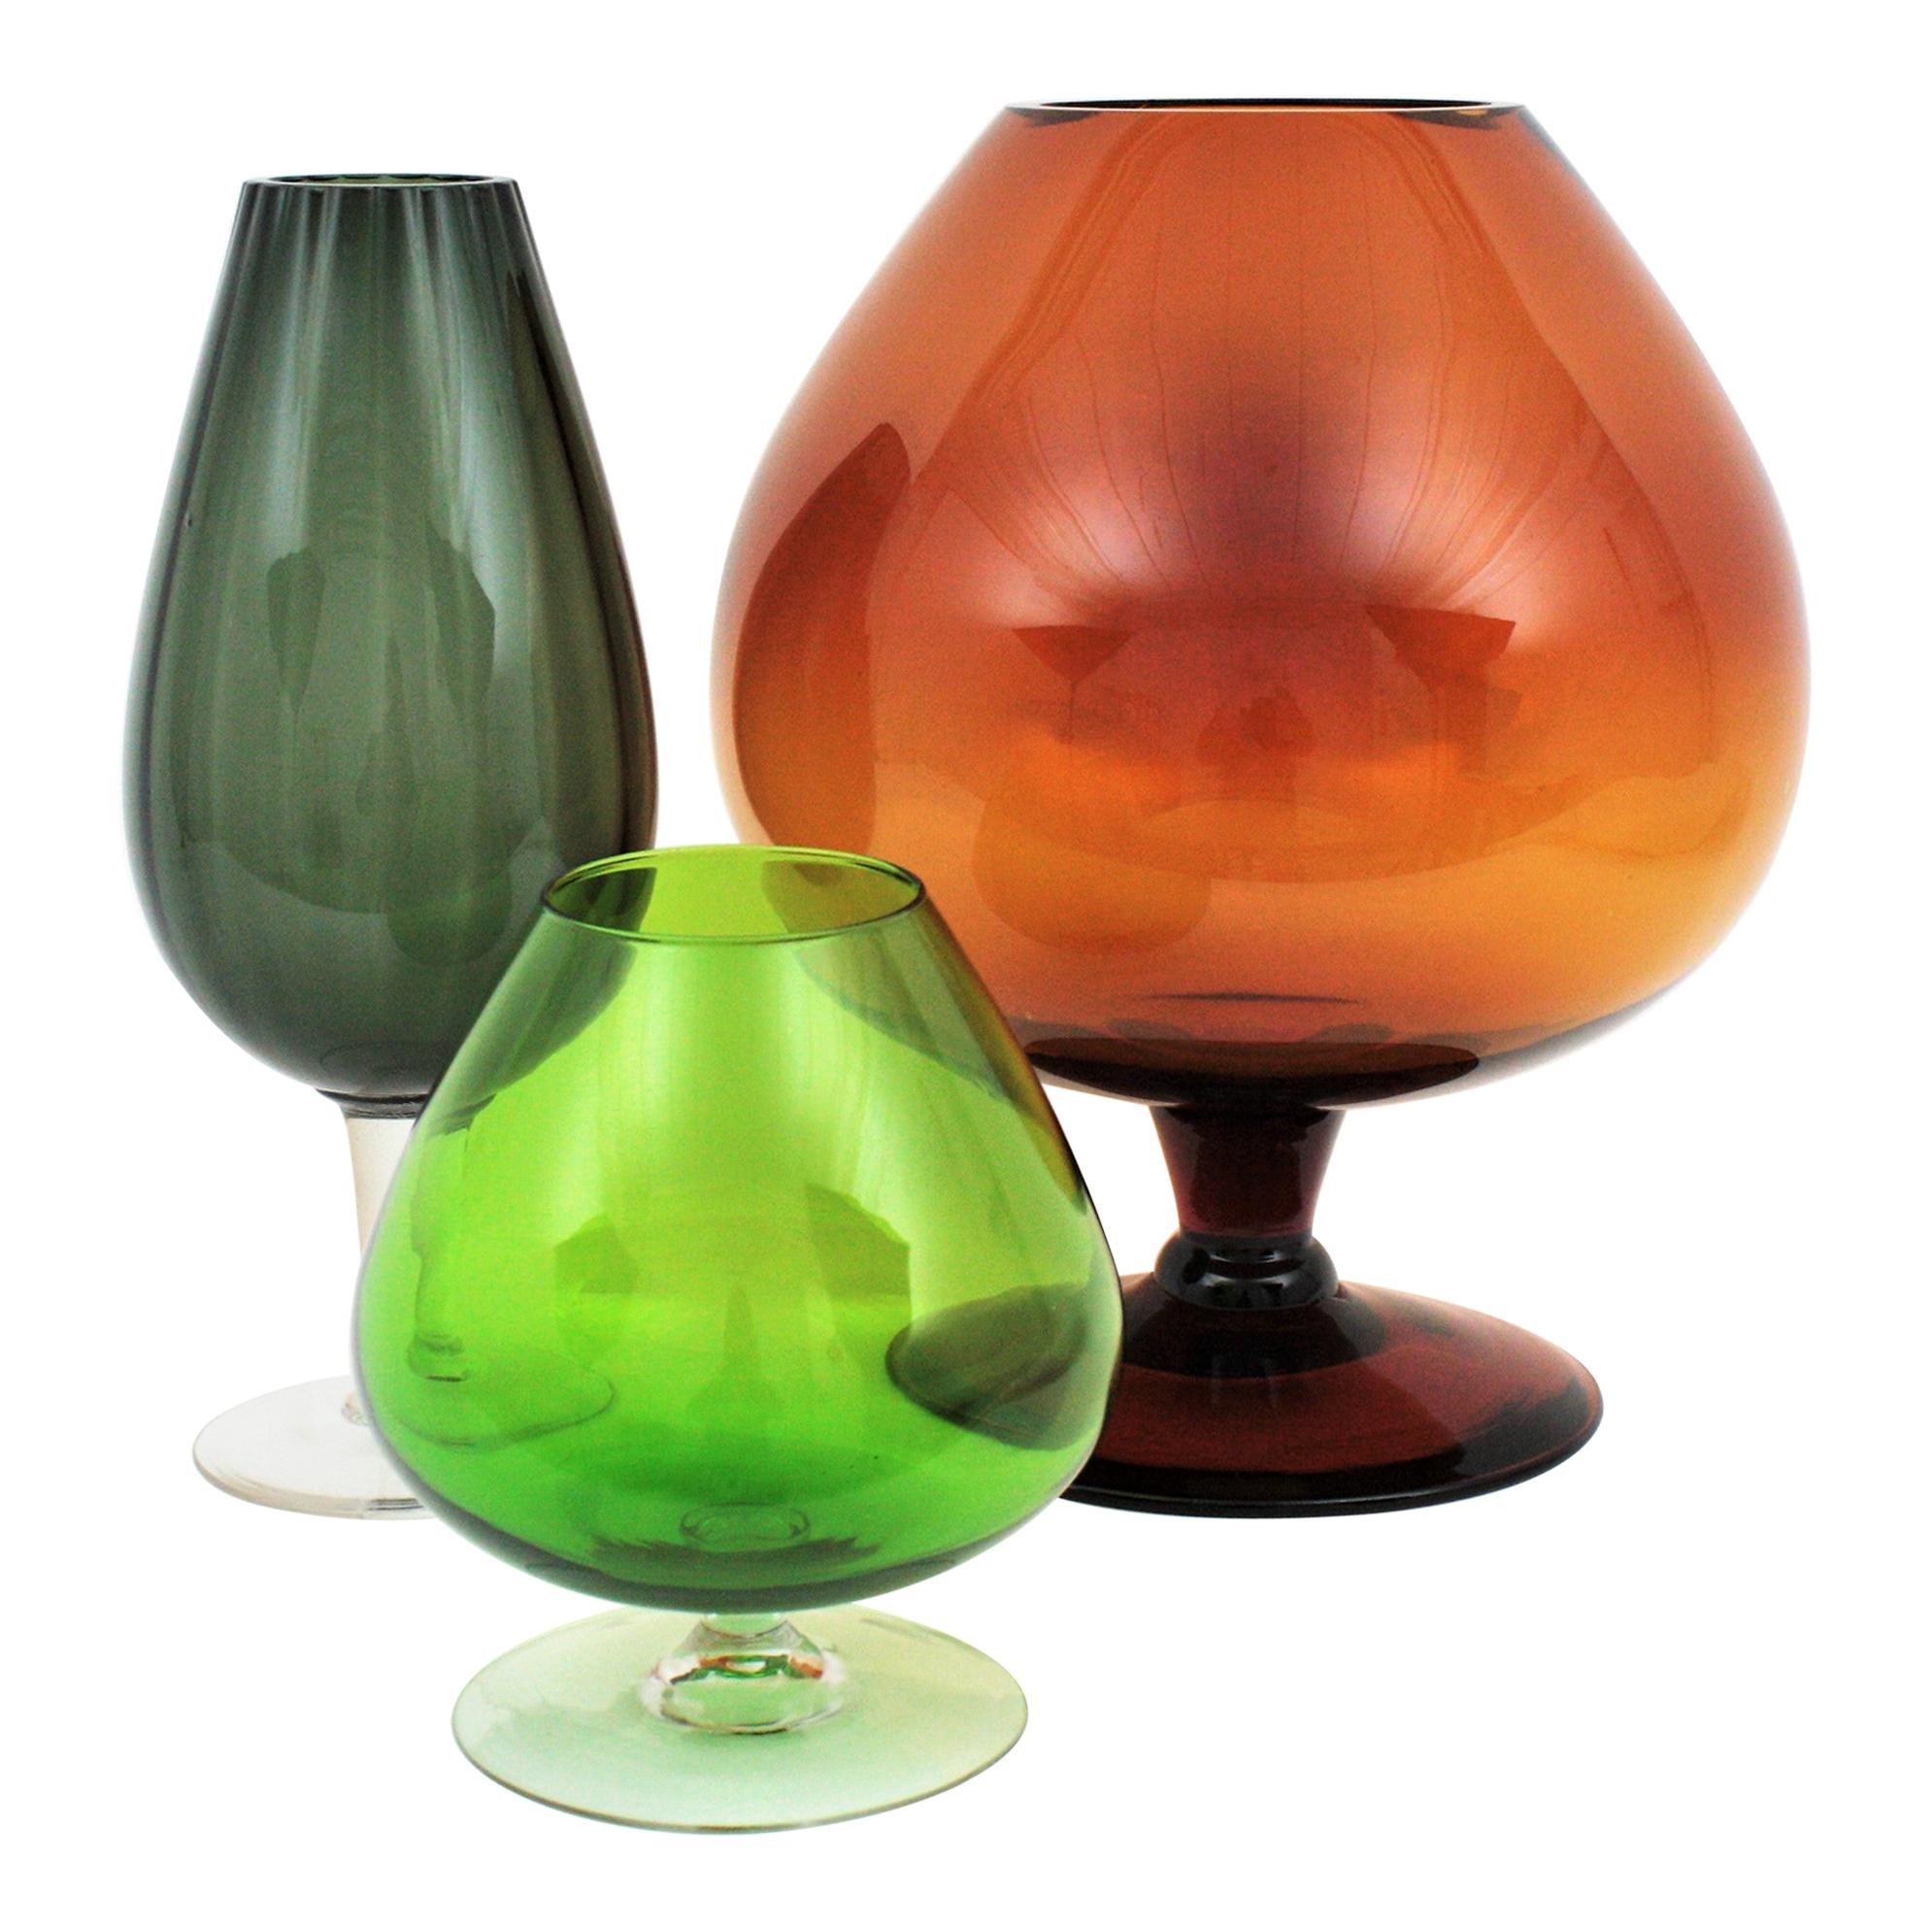 Oversized Midcentury Cocktail Glasses, Set of Three